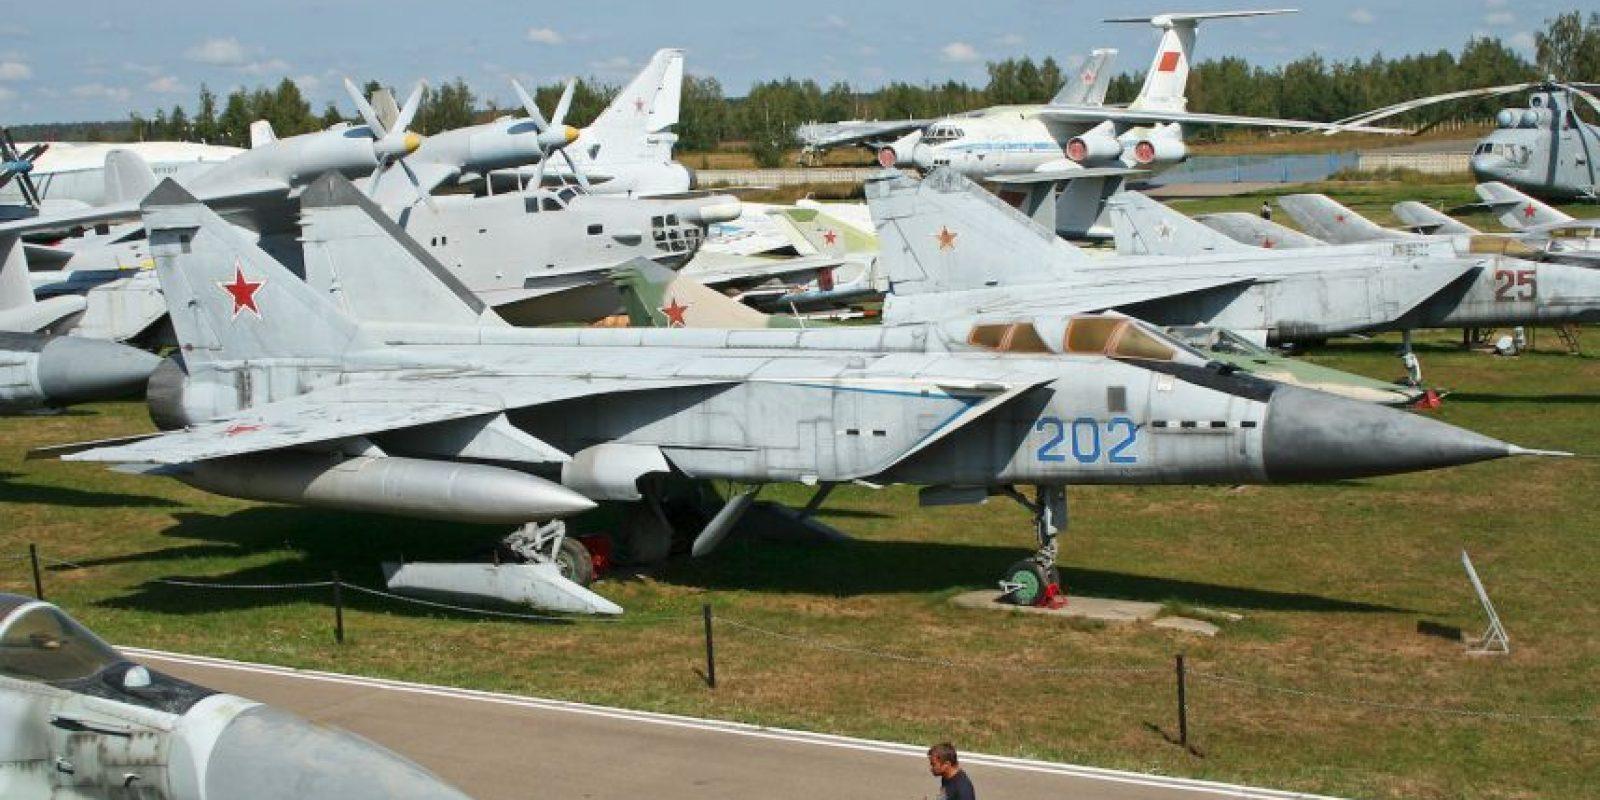 1. MiG-31E Foxhound. Velocidad máxima de Mach 2,83 (3.466,9 km/h) Foto:Wikimedia